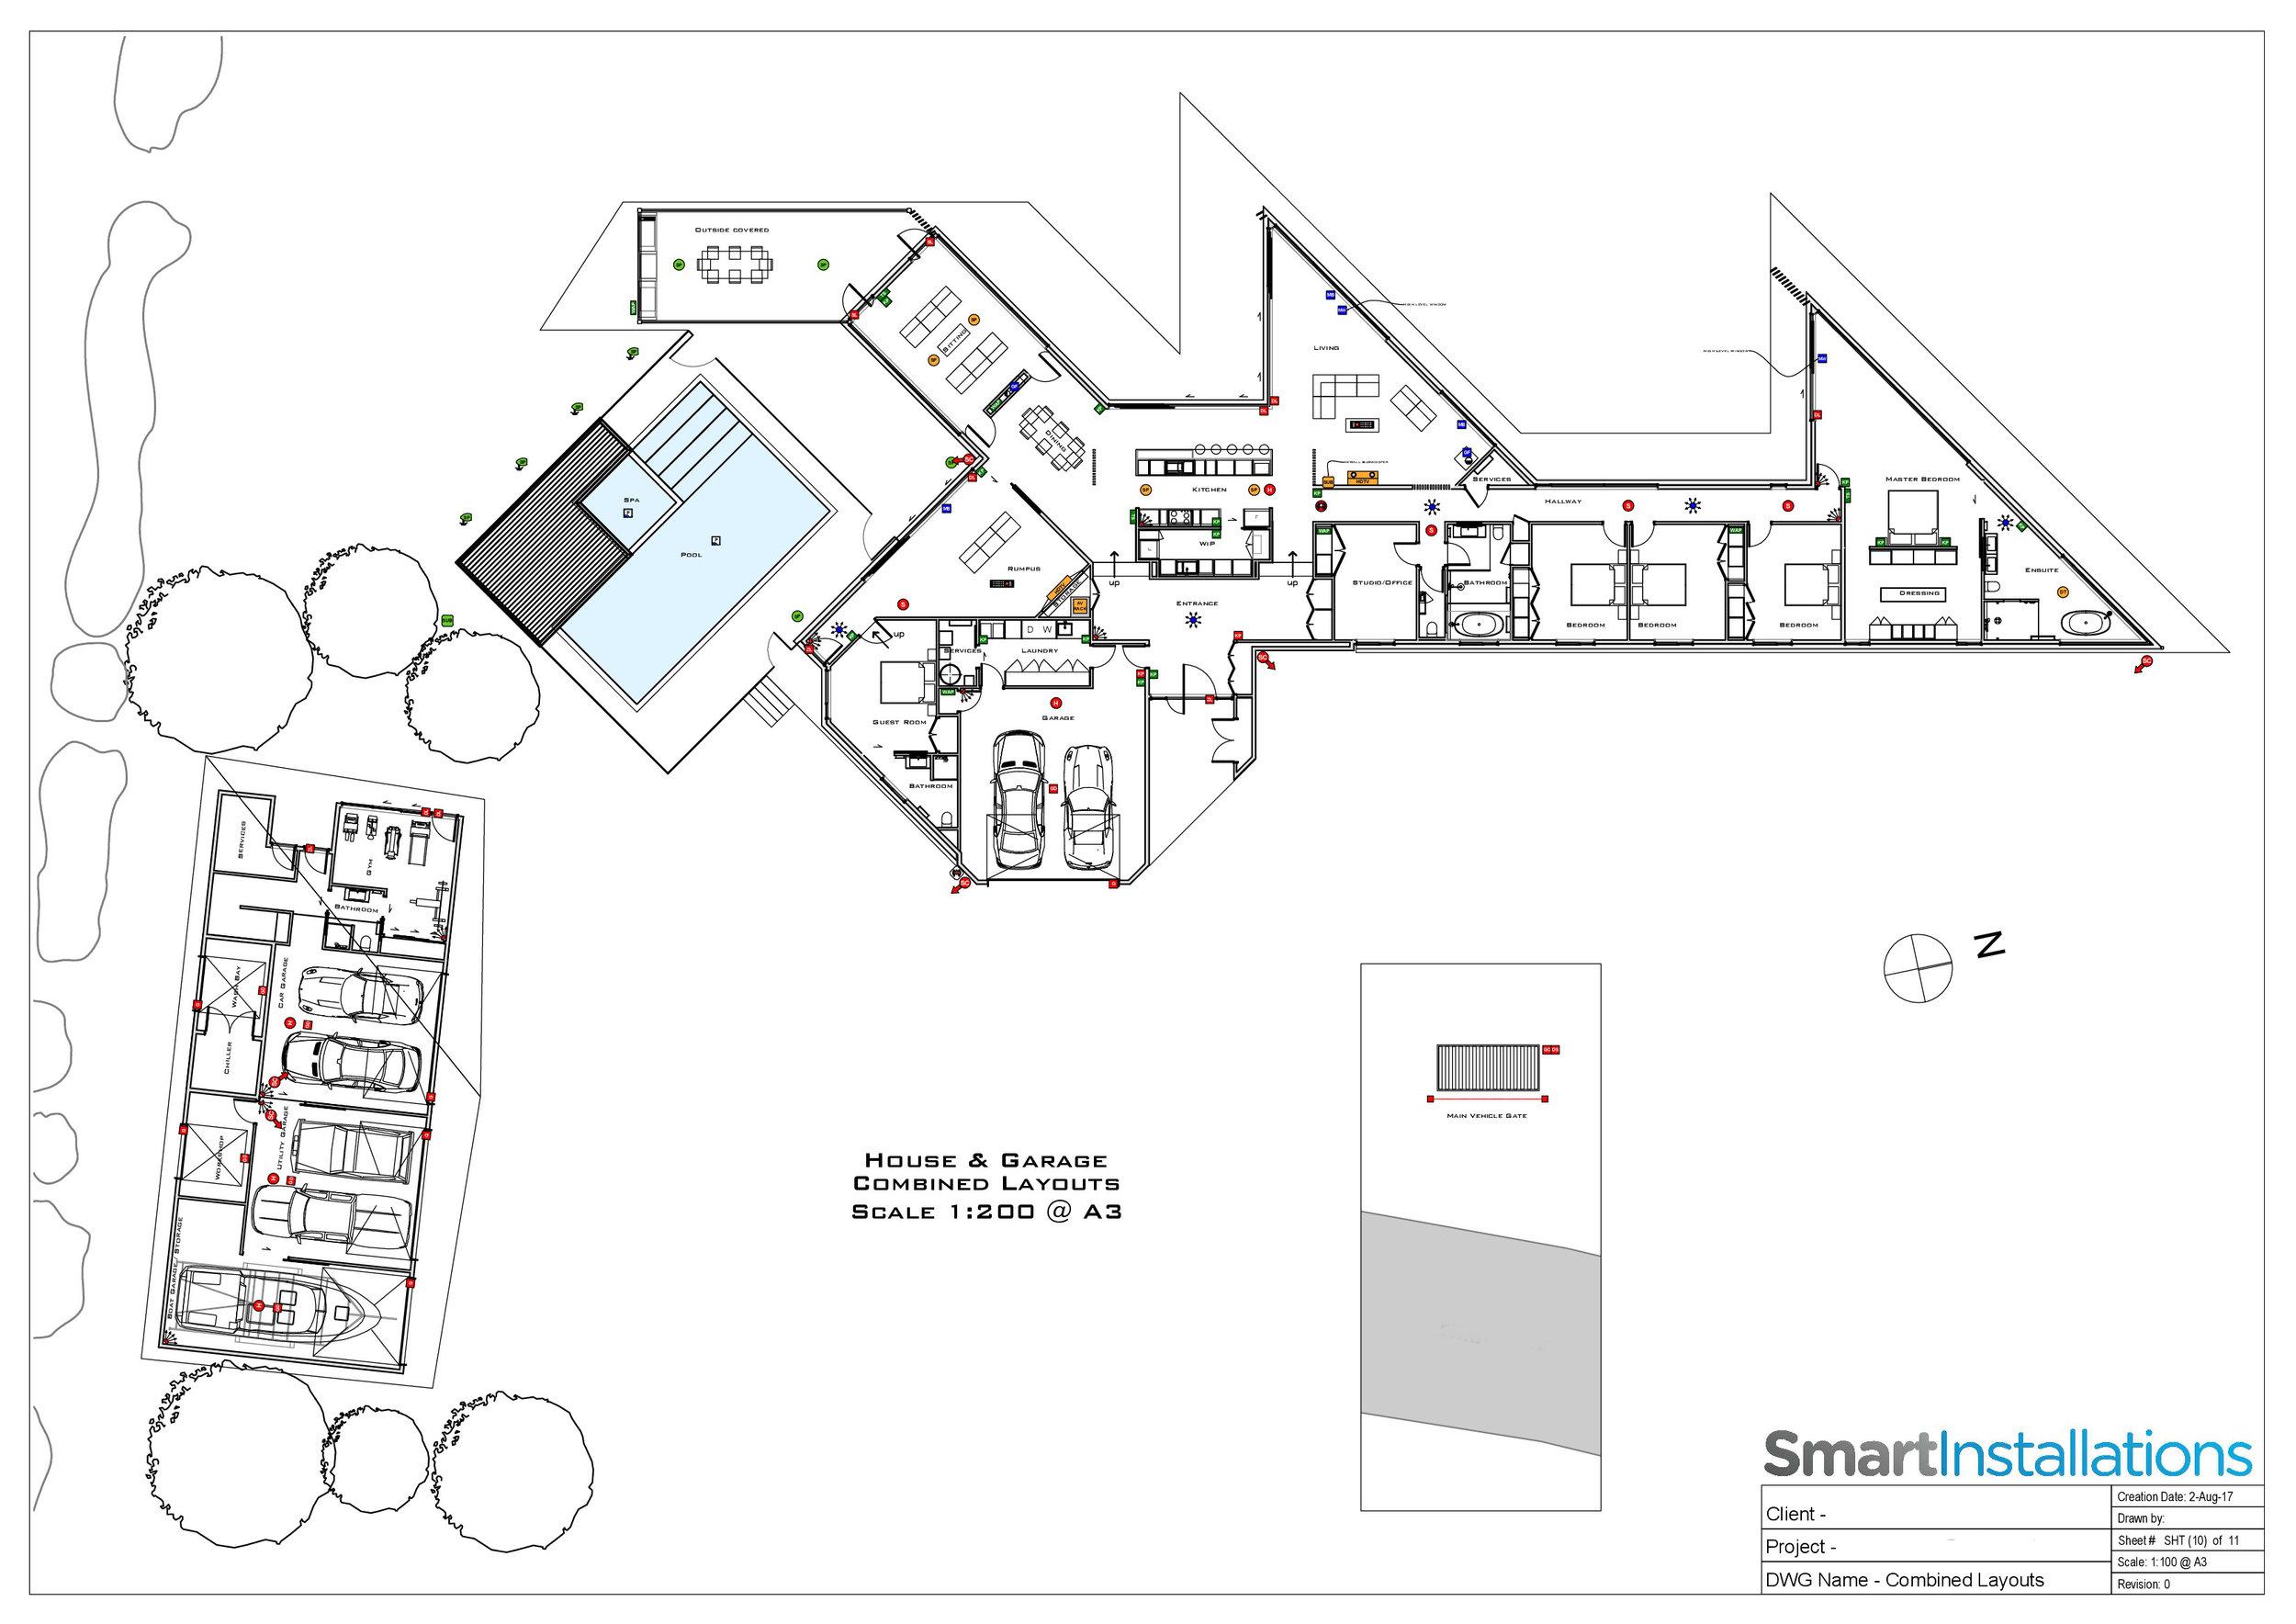 System Design Overview Image